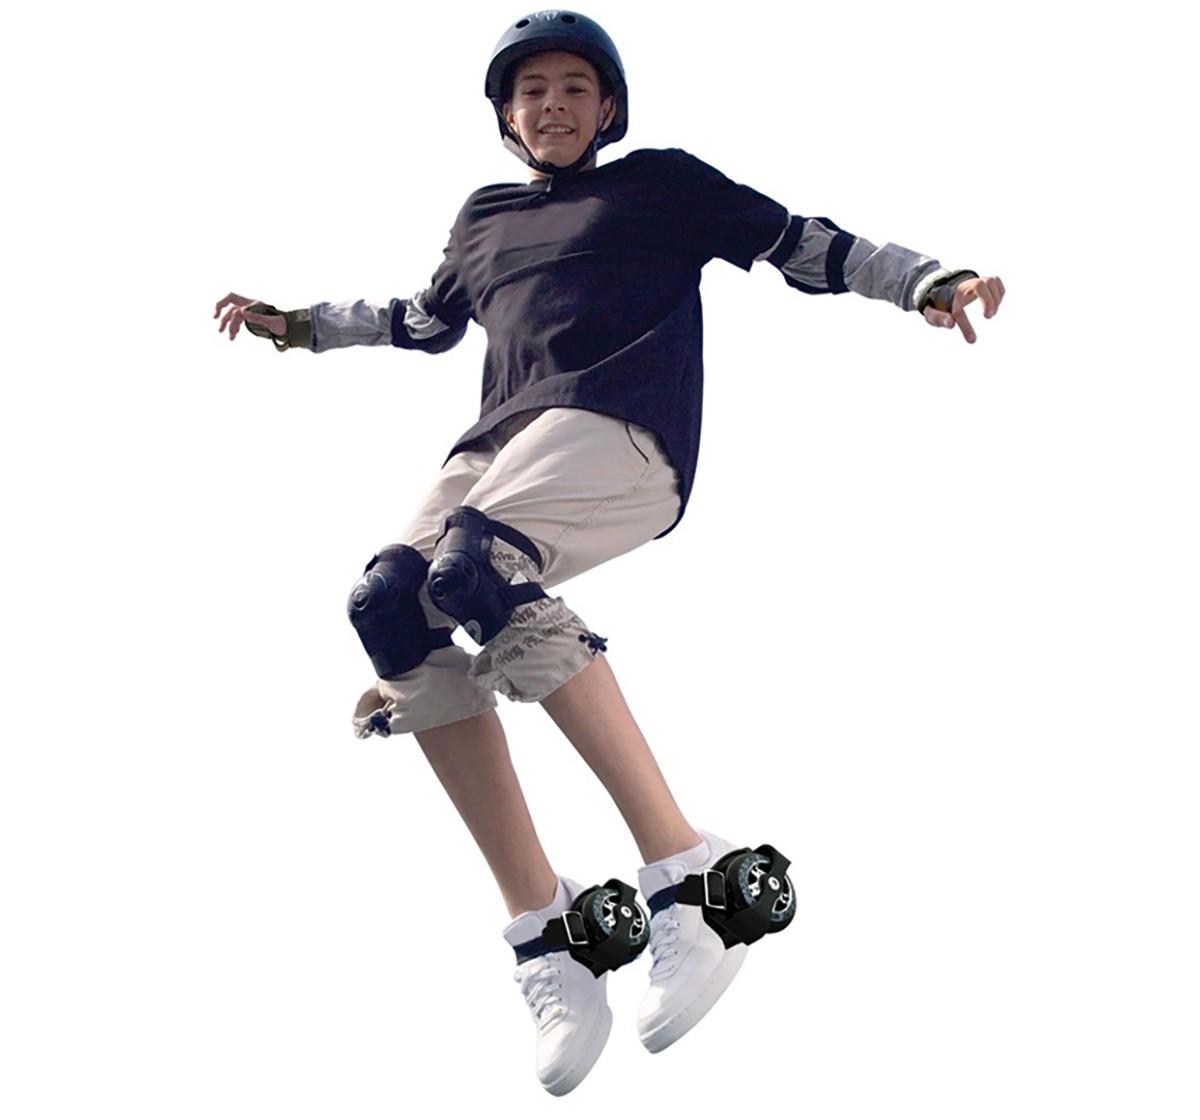 Hamleys Street Gliders Blue Skates and Skateboards for Kids age 5Y+ (Blue)